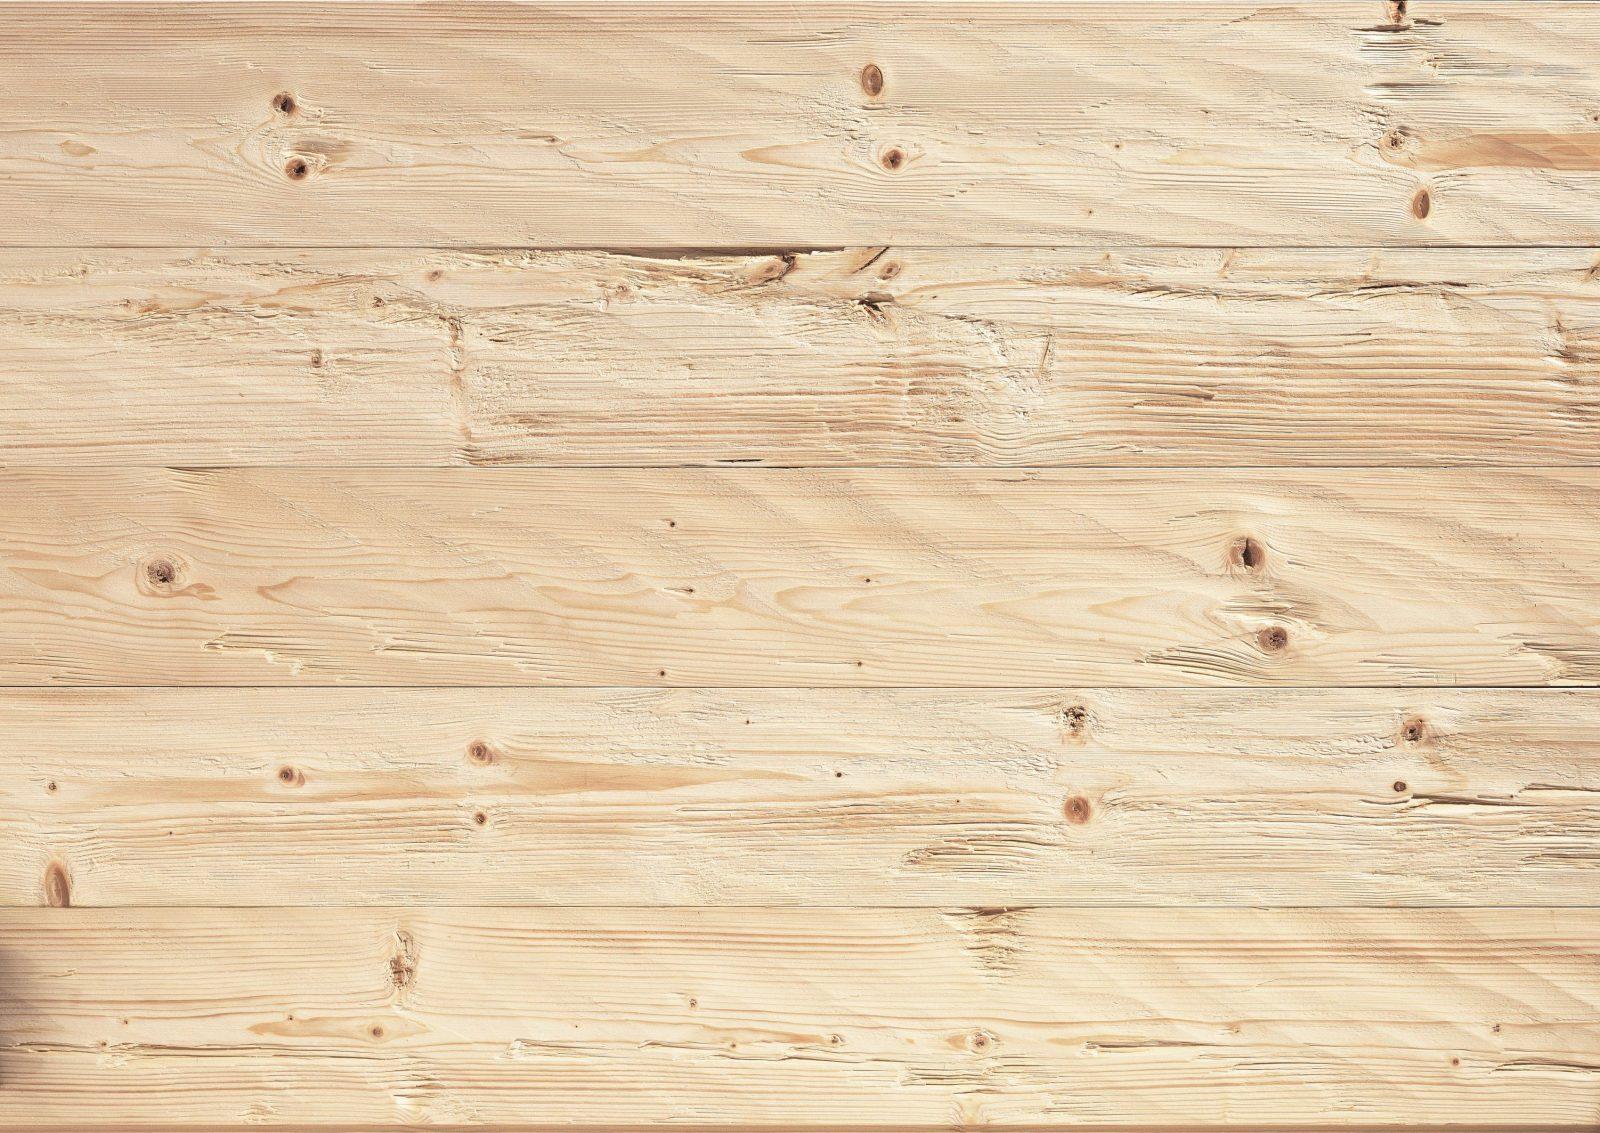 Wandverkleidung Holz Anleitung  Alle Ideen Über Home Design von Wandverkleidung Holz Innen Anleitung Photo